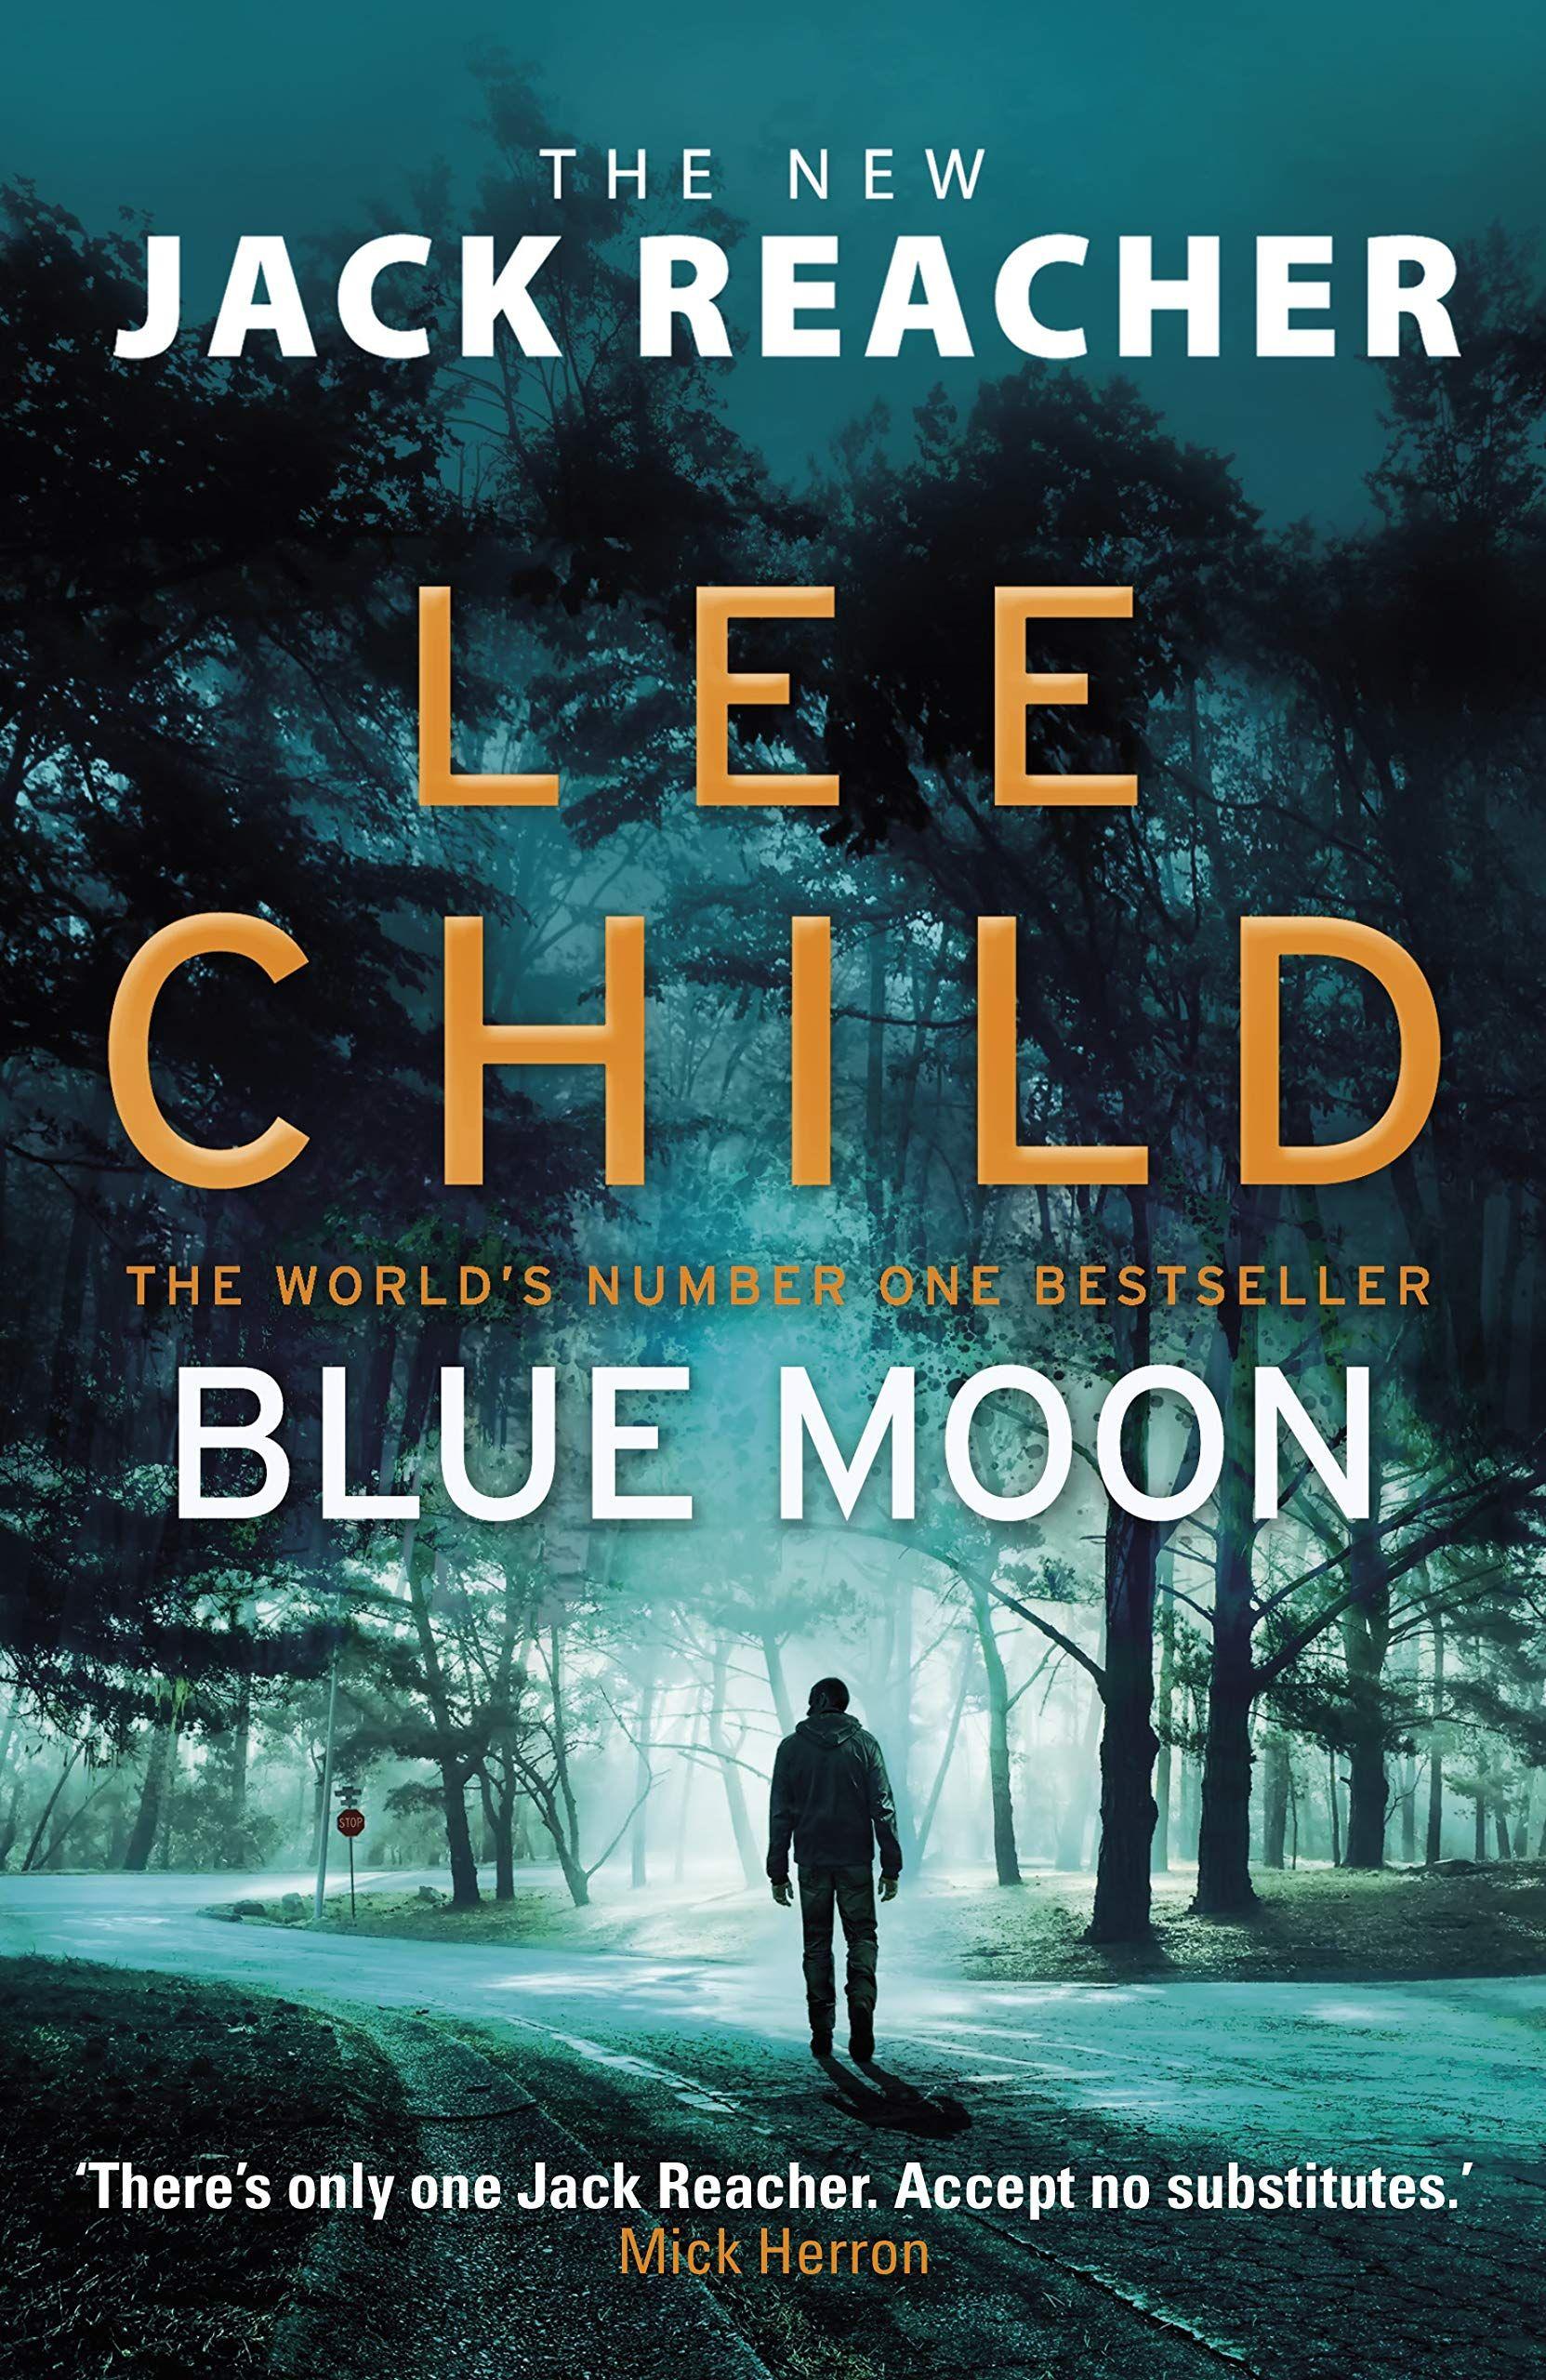 Pdf Blue Moon Jack Reacher 24 By Lee Child Jack Reacher Moon Book Lee Child